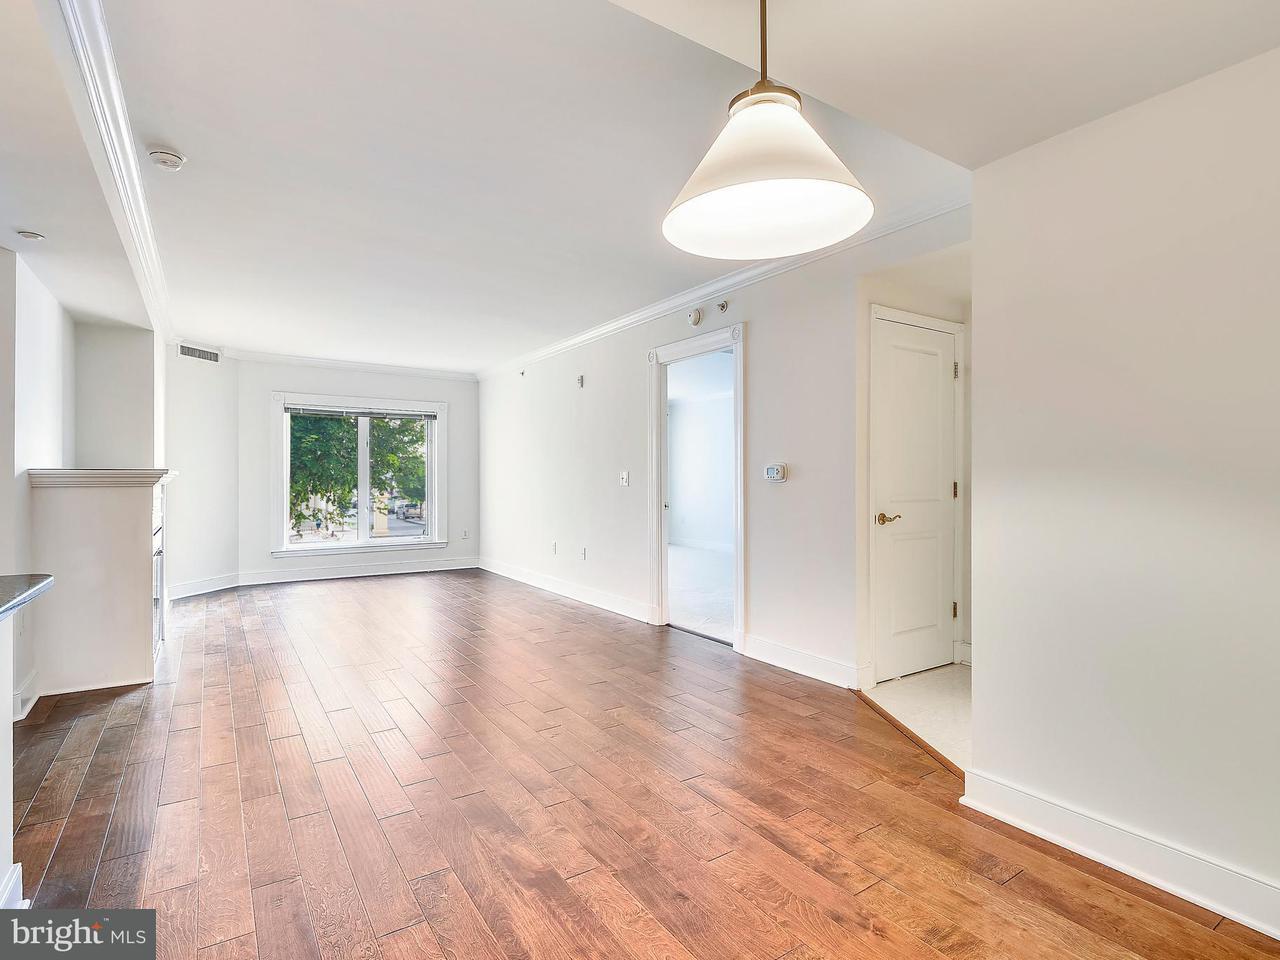 Additional photo for property listing at 5 PARK PL #202 5 PARK PL #202 Annapolis, Мэриленд 21401 Соединенные Штаты